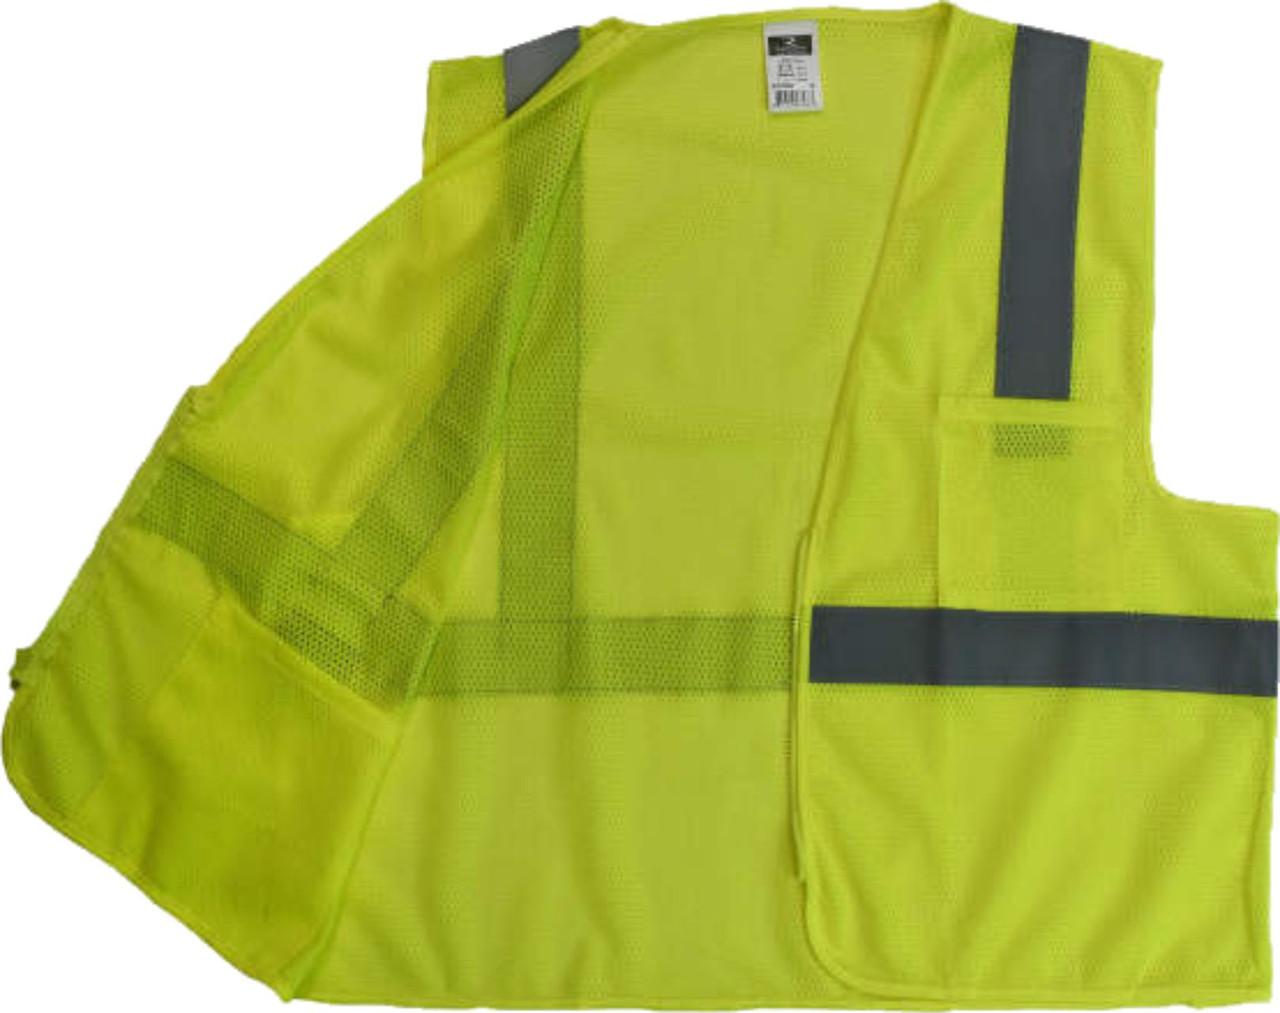 Safety Vest with Pockets